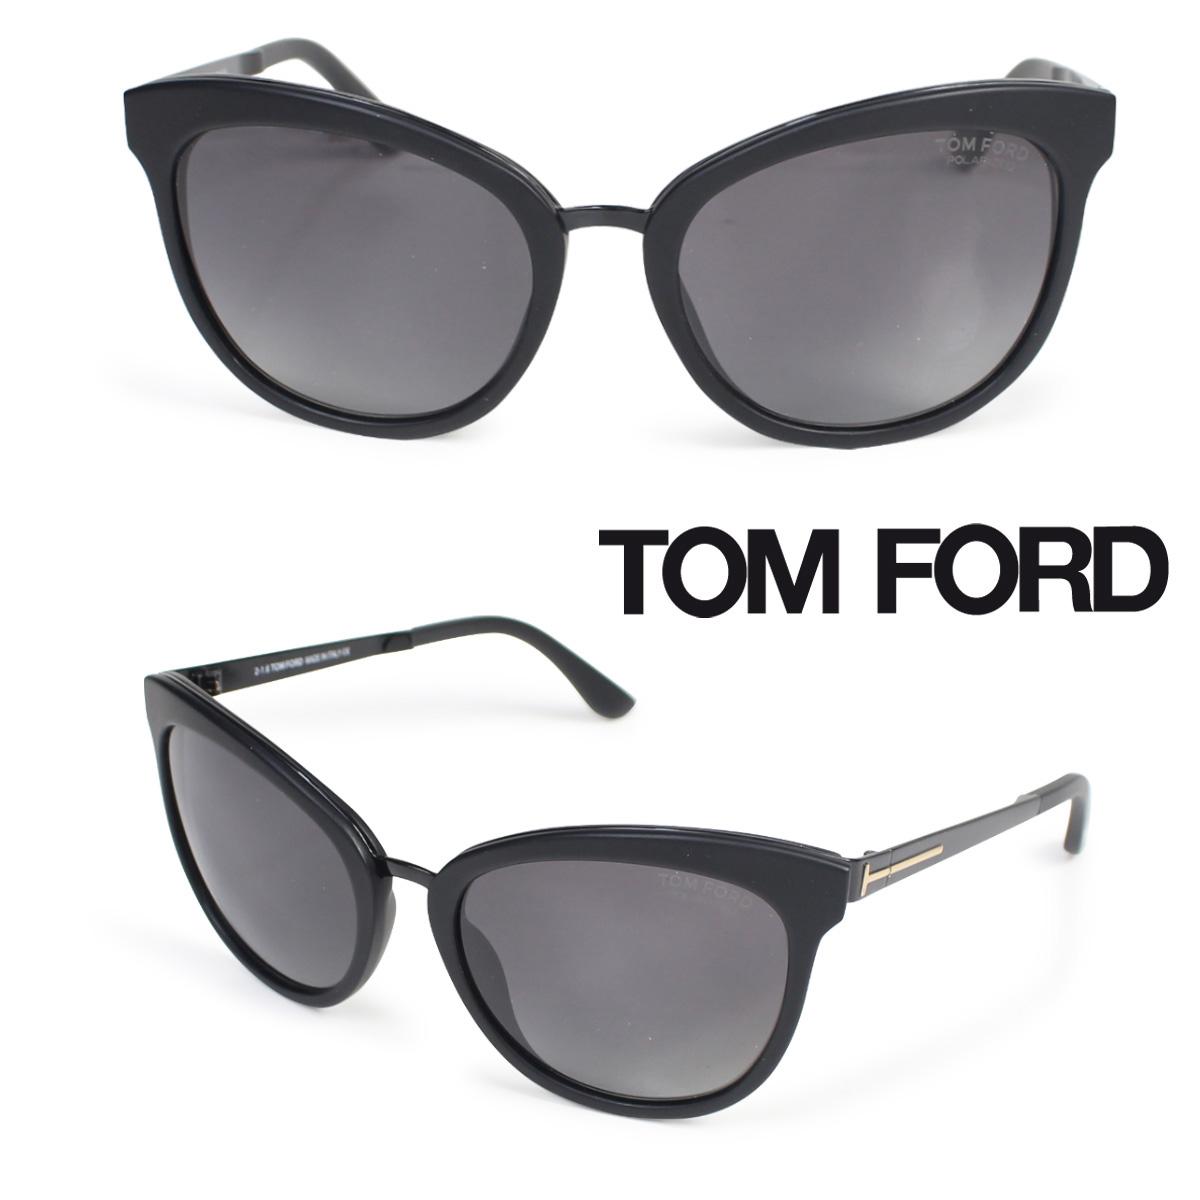 TOM FORD トムフォード サングラス メガネ レディース アイウェア FT0461 EMMA SUNGLASSES ブラック